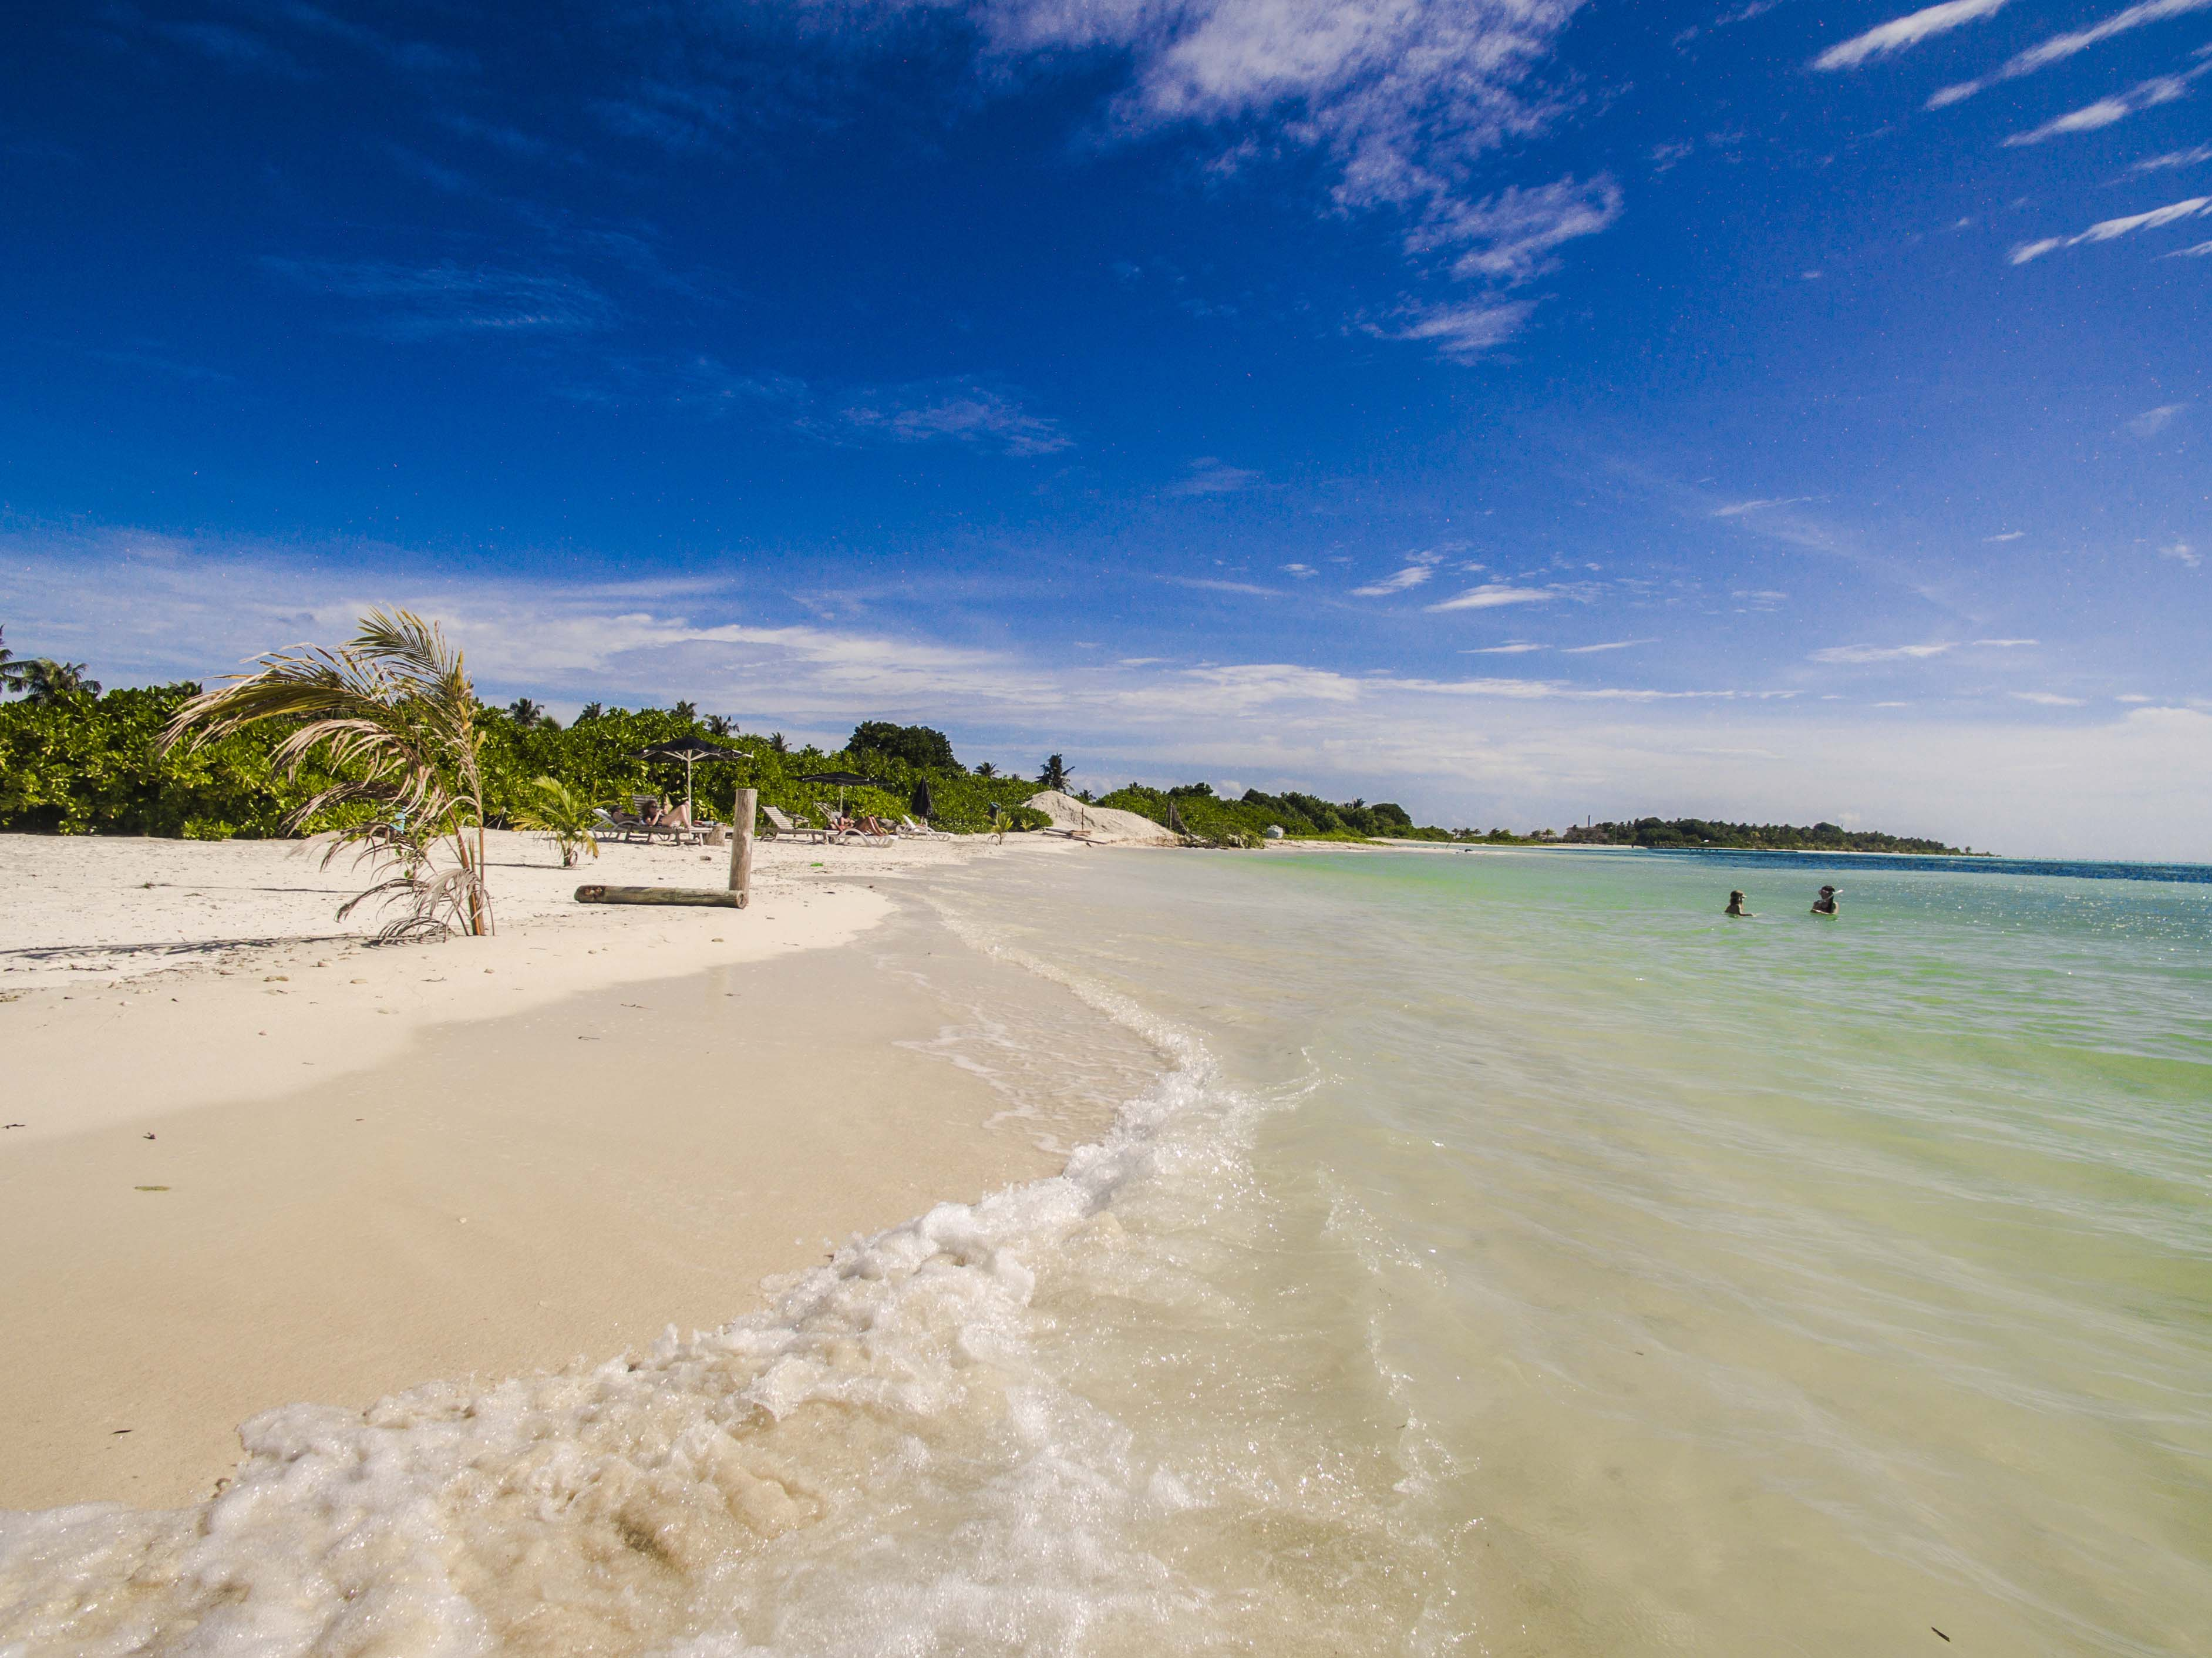 Lacabana Maldives  A Dh Maamigili Island (16)